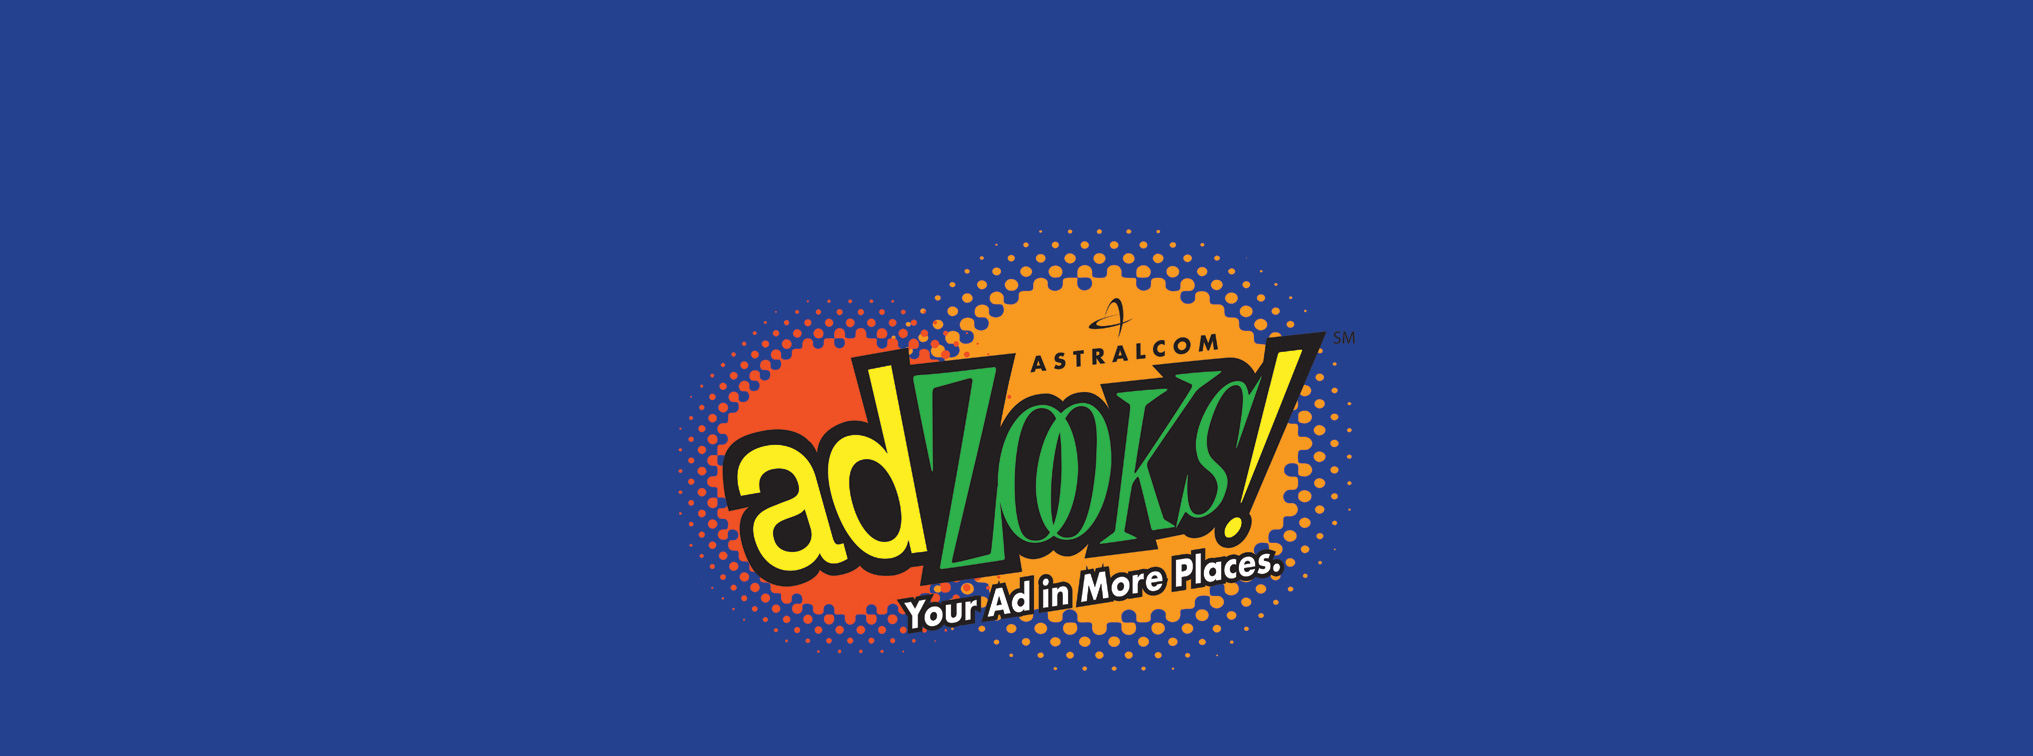 Targeted Display Ads